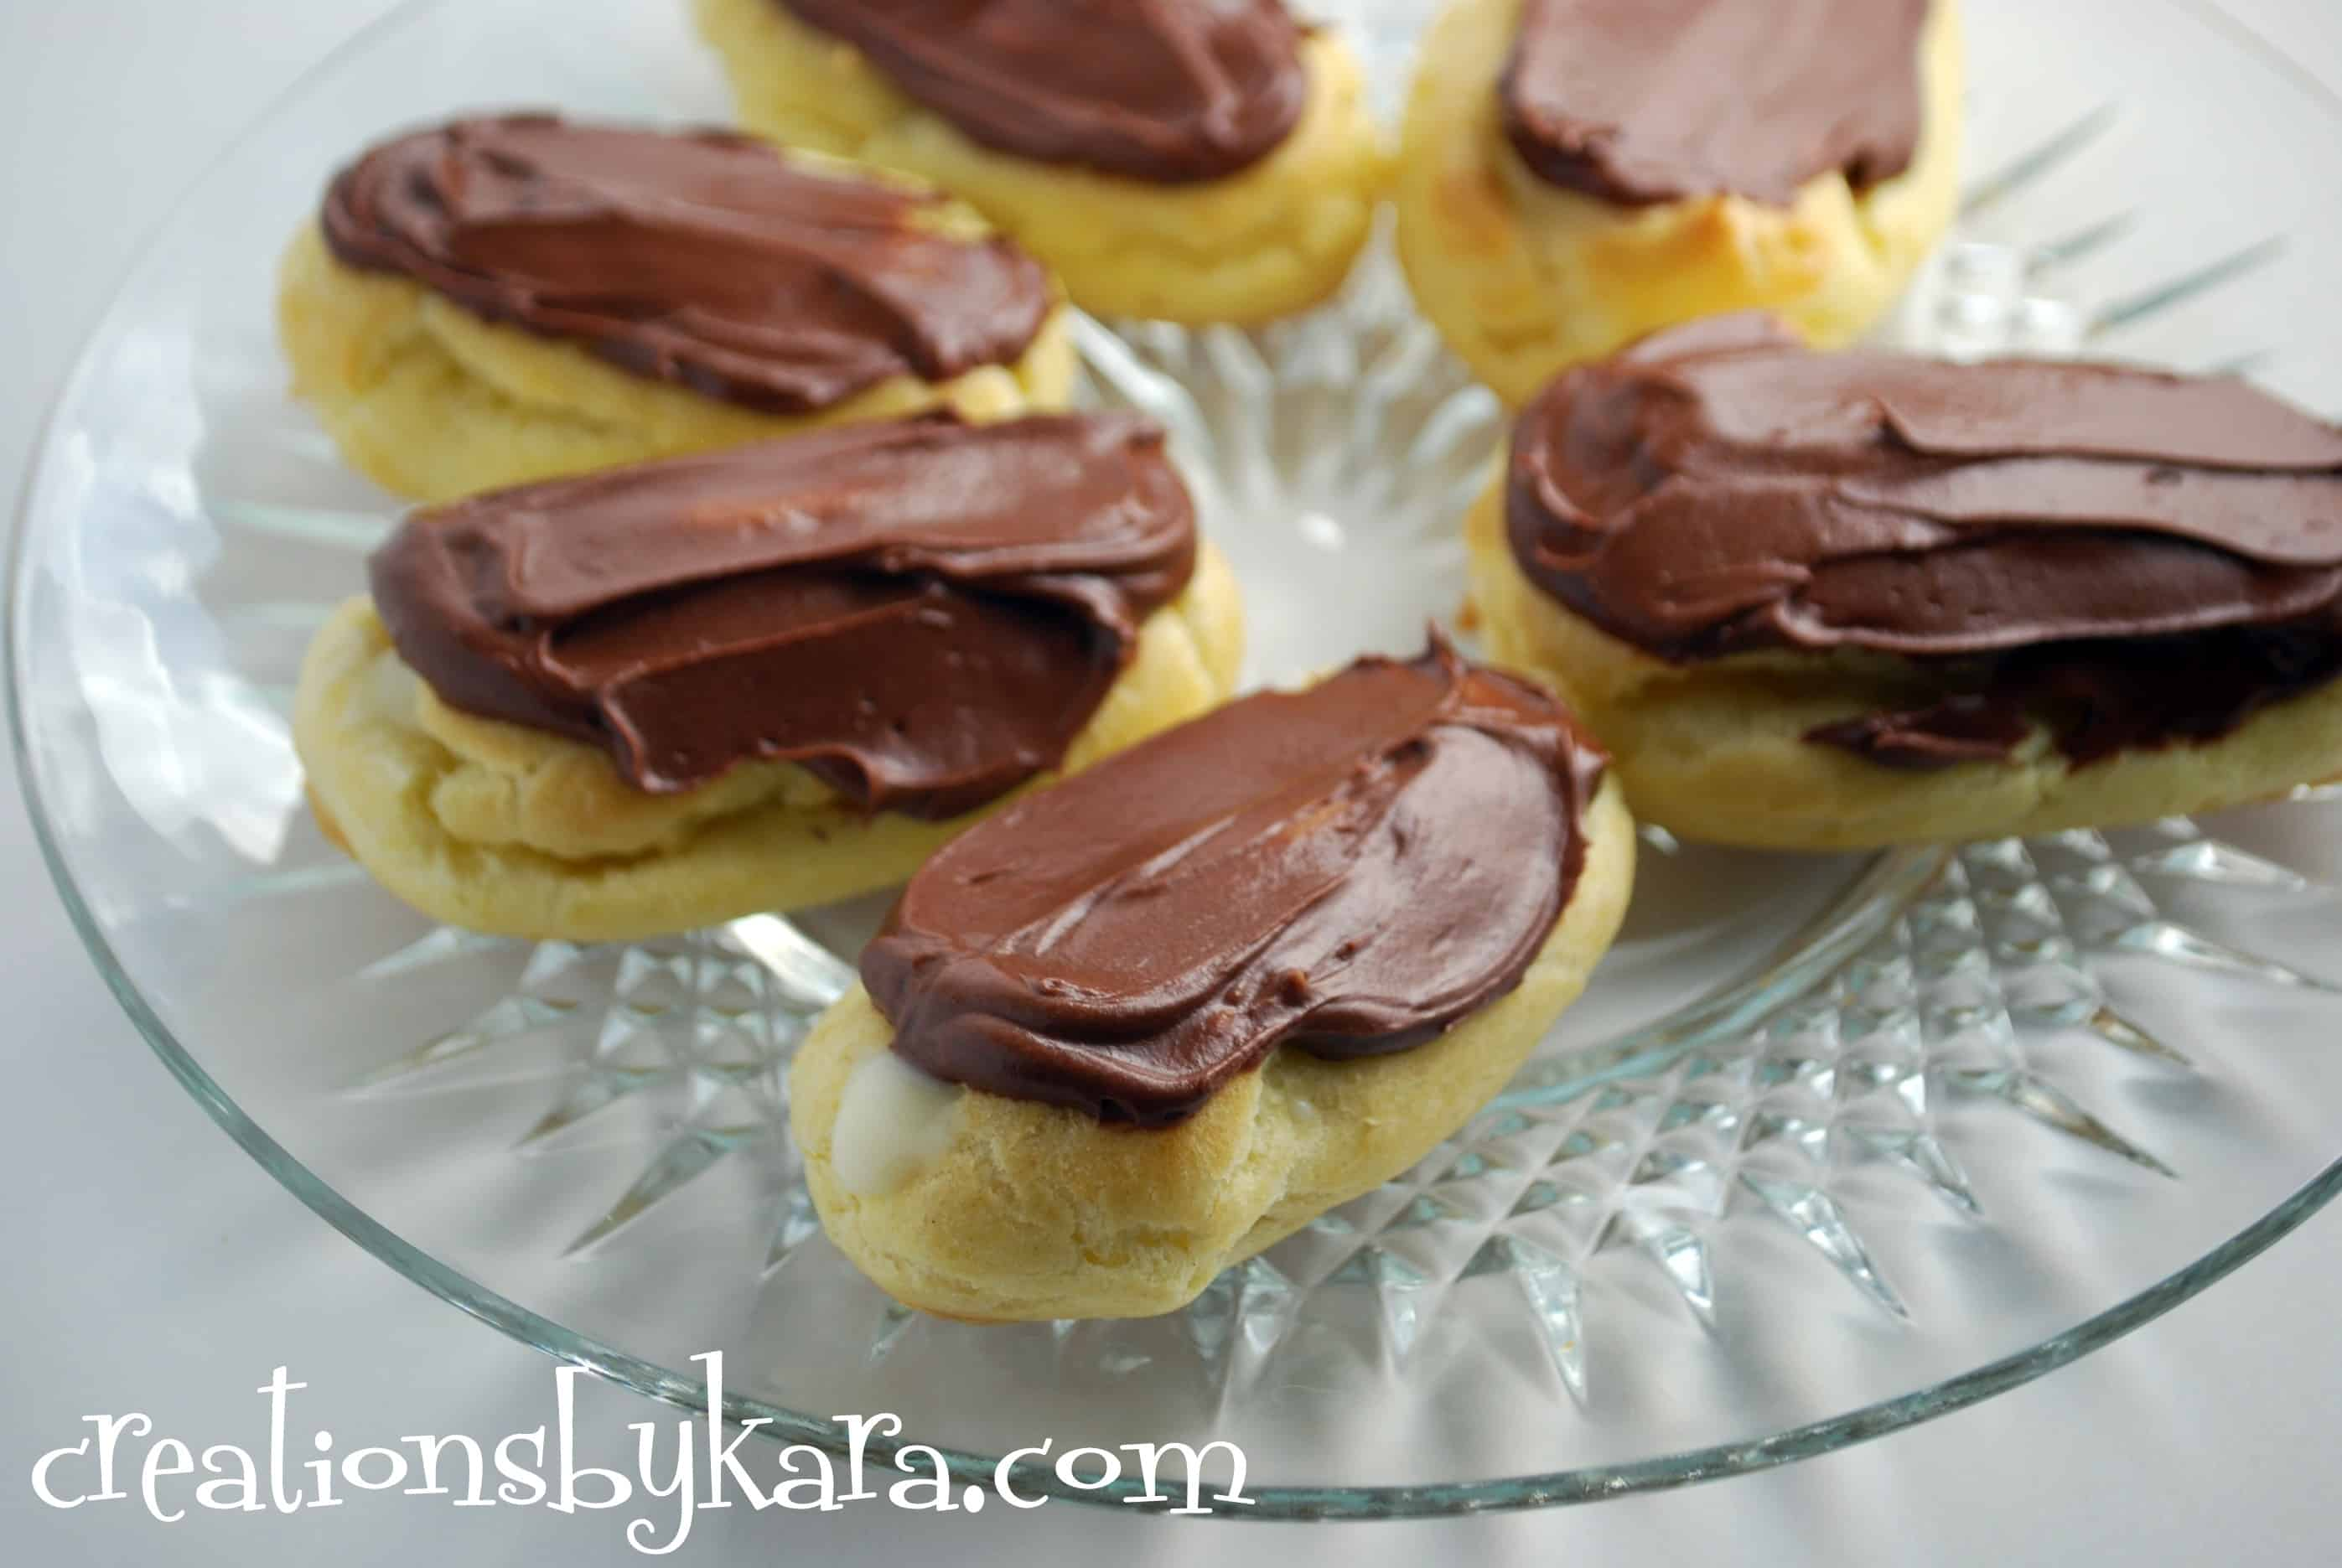 Chocolate Eclairs - Creations by Kara